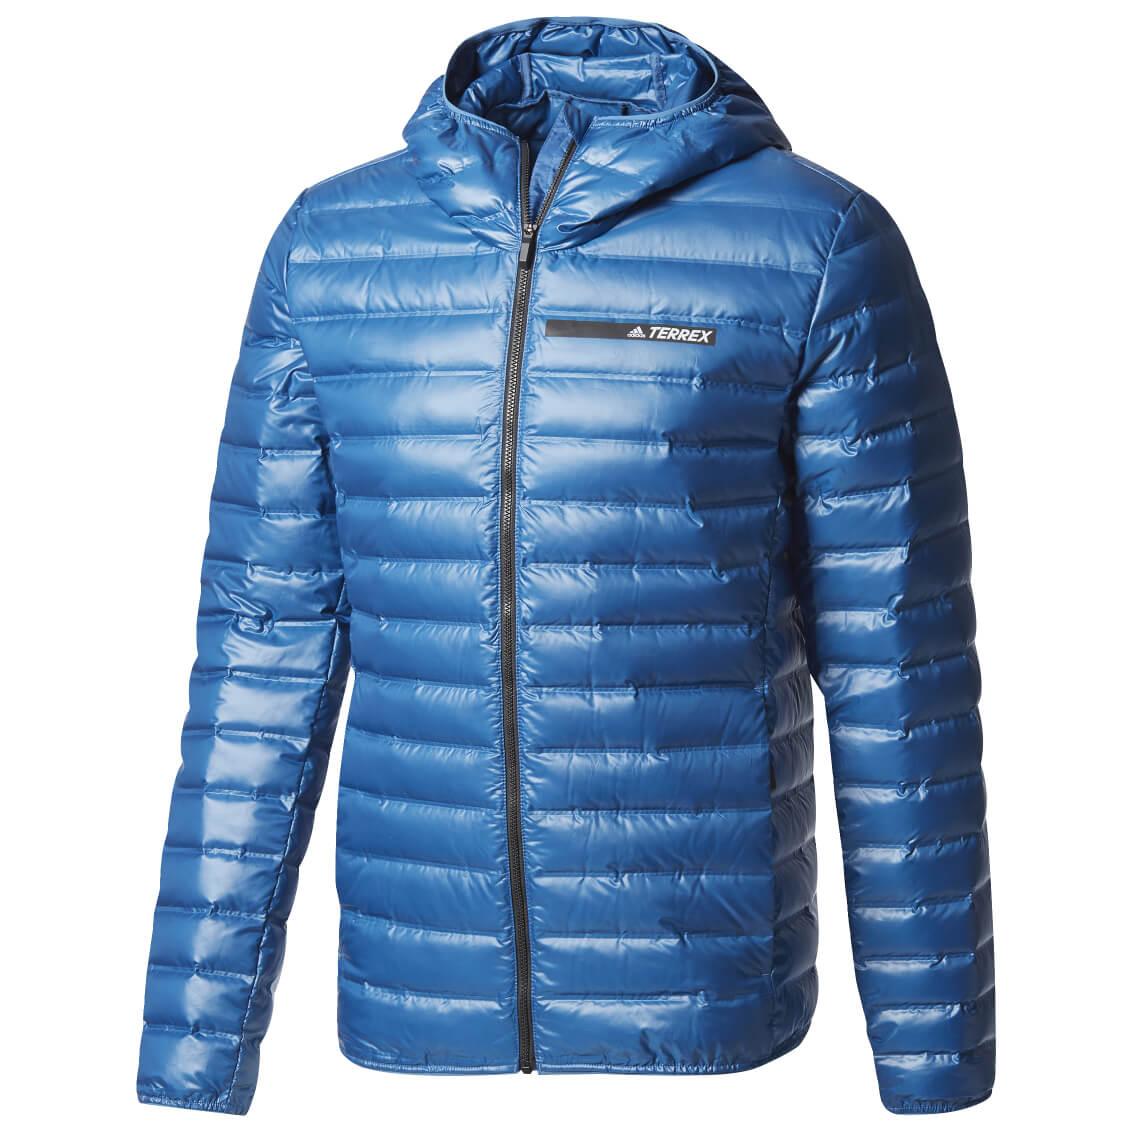 Adidas Terrex Lite Down Hooded Jacket Daunenjacke Herren